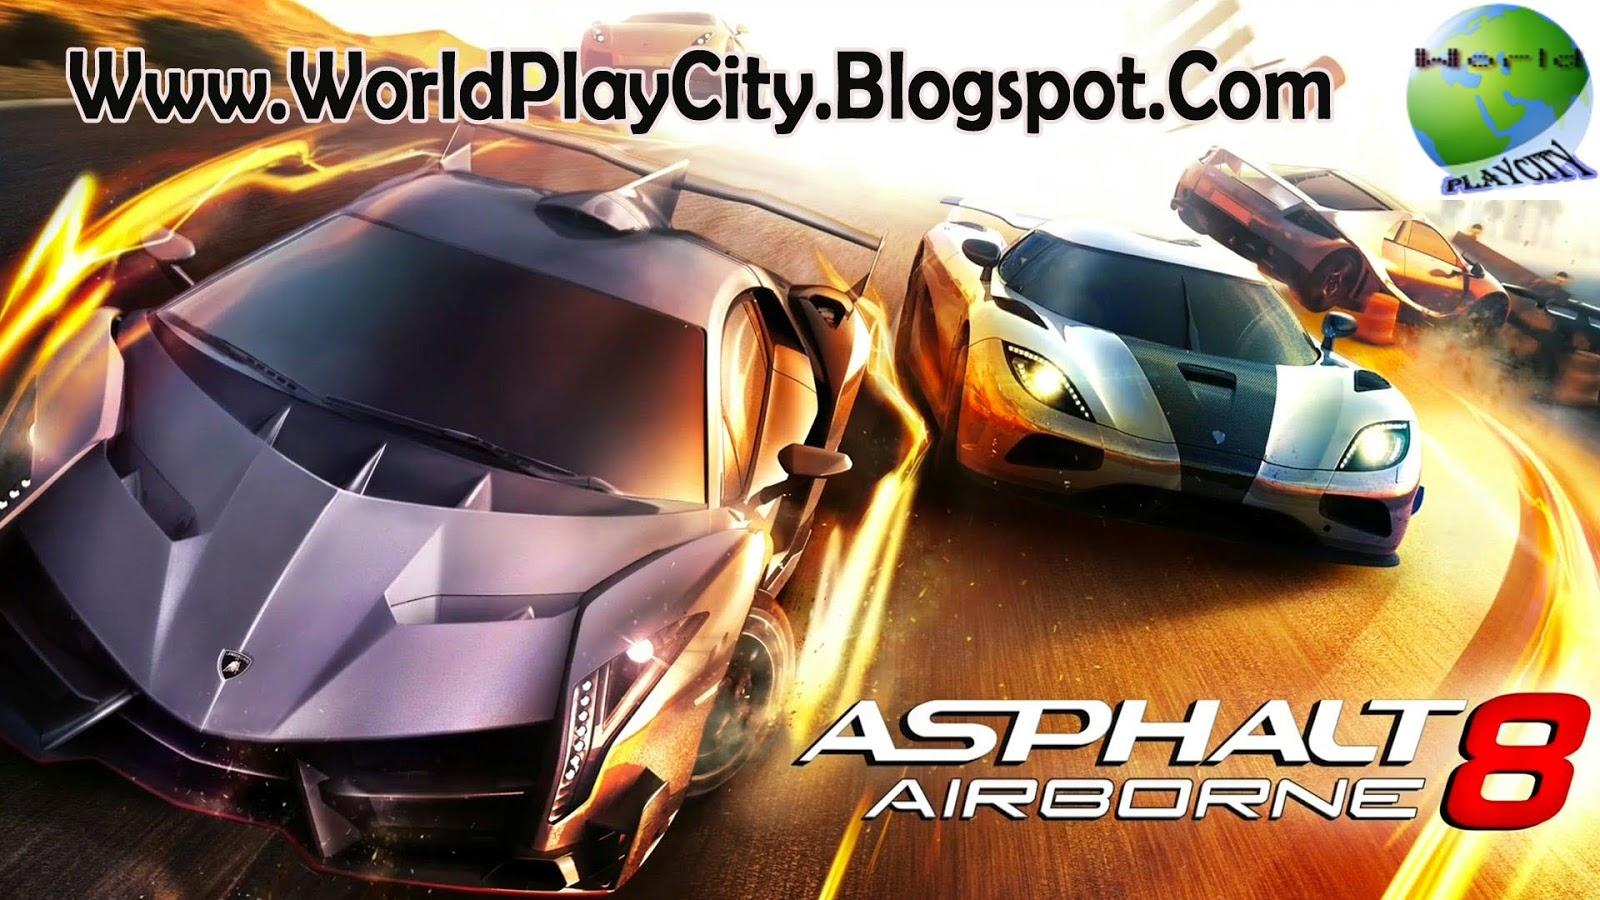 Free Games - Download Free Games - Asphalt 8 Airborne